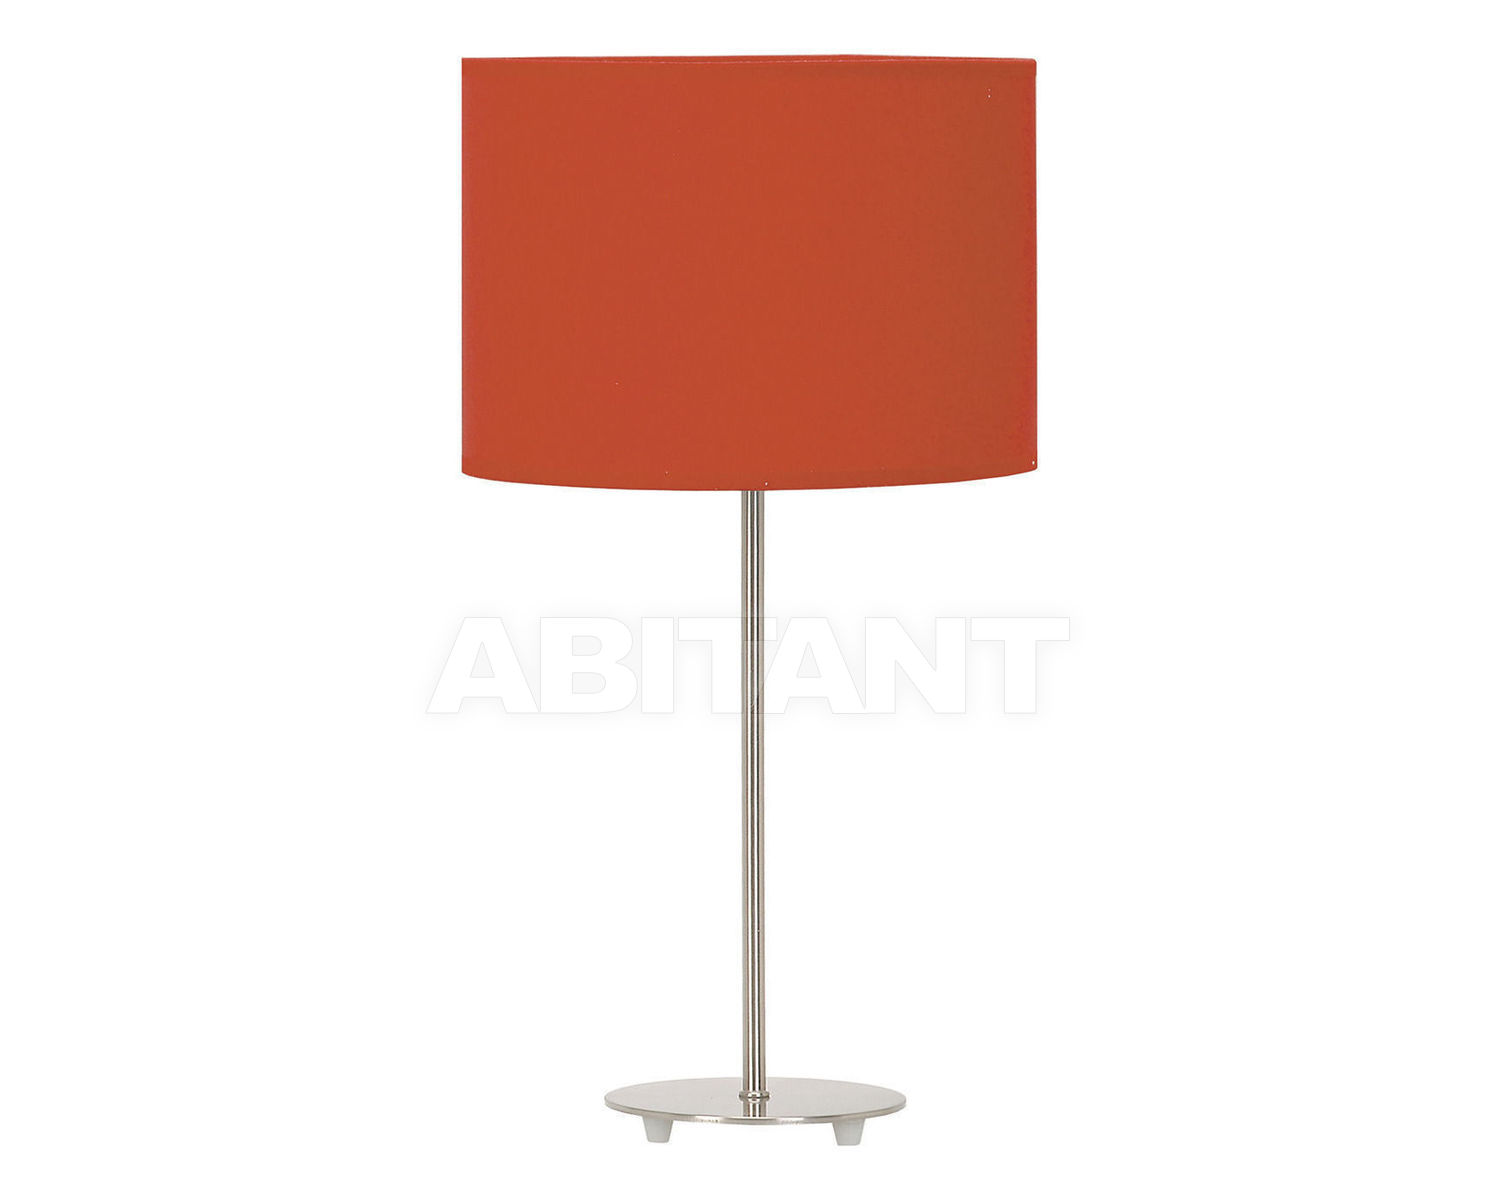 Купить Лампа настольная Linea Verdace 2012 LV 74001/R